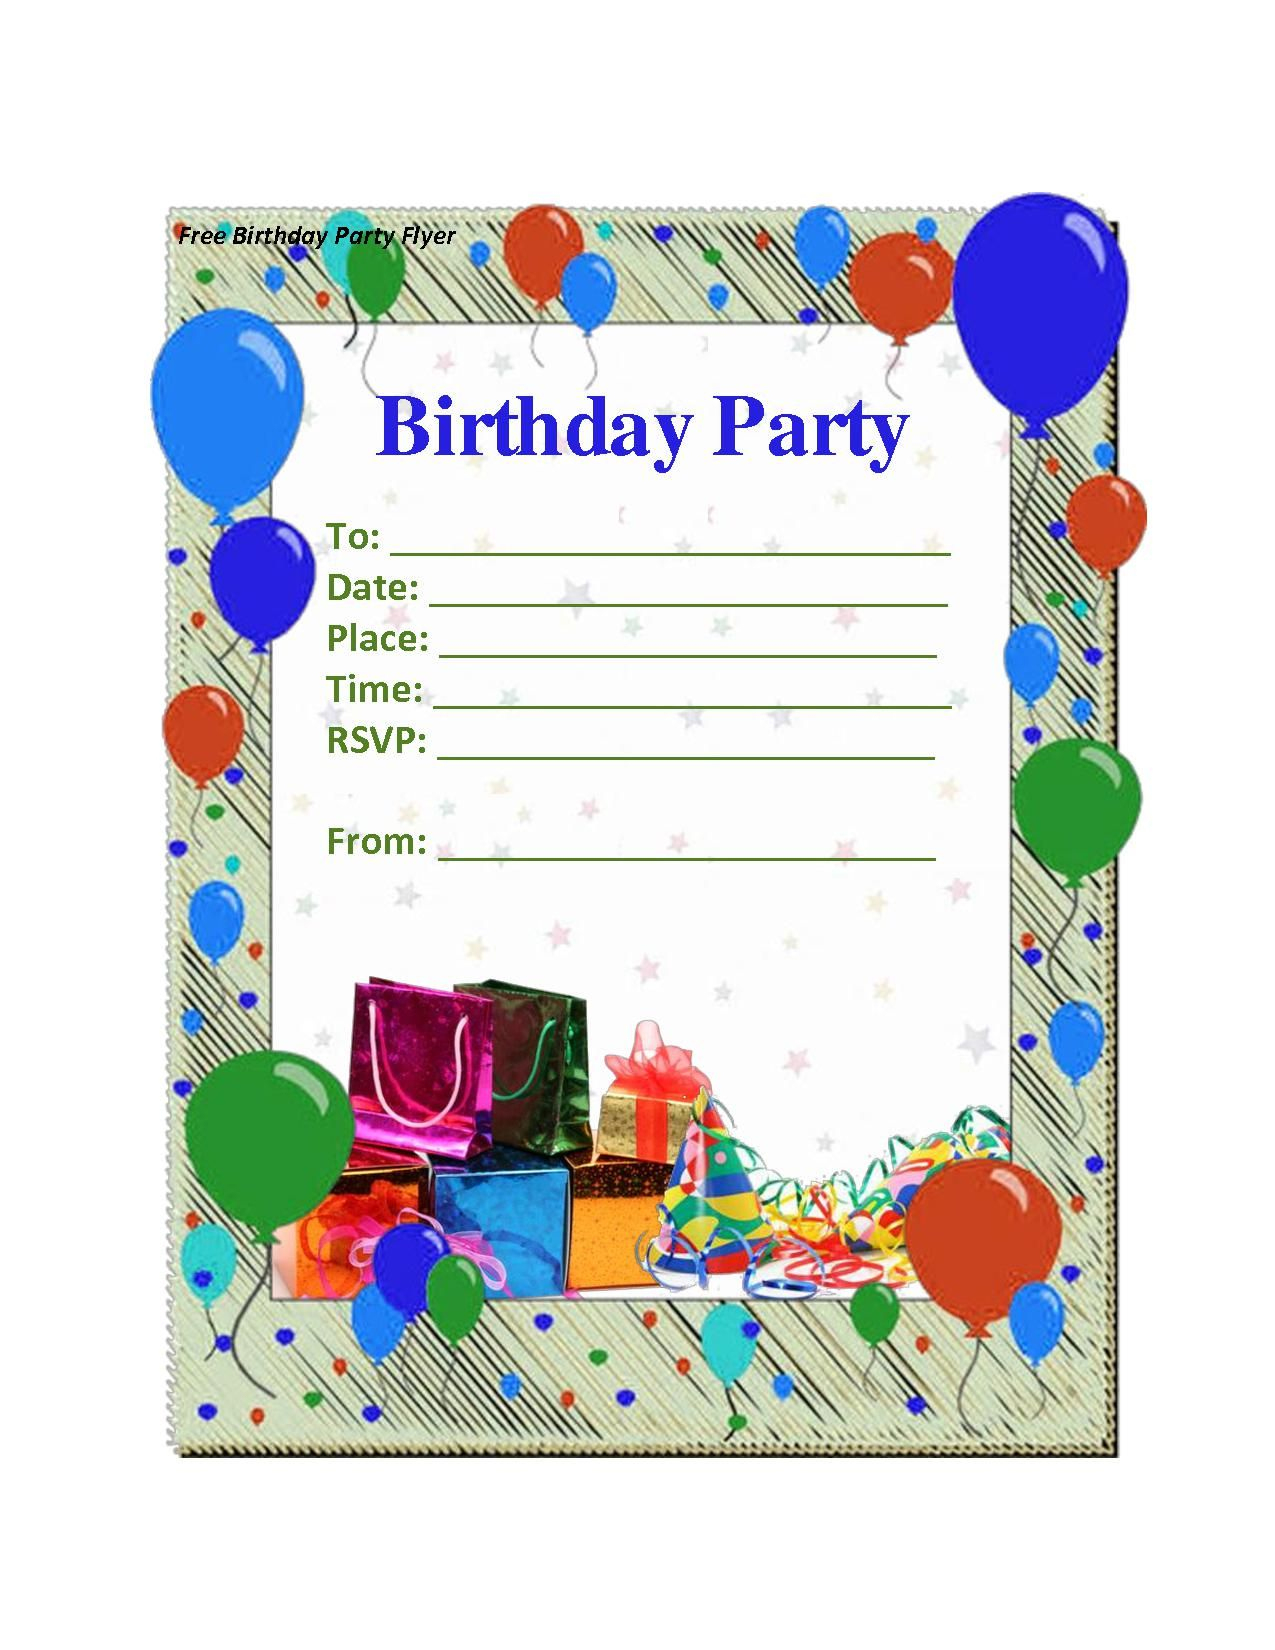 Free Party Invitation Maker Online   Star Wars Party Invitation - Make Printable Party Invitations Online Free